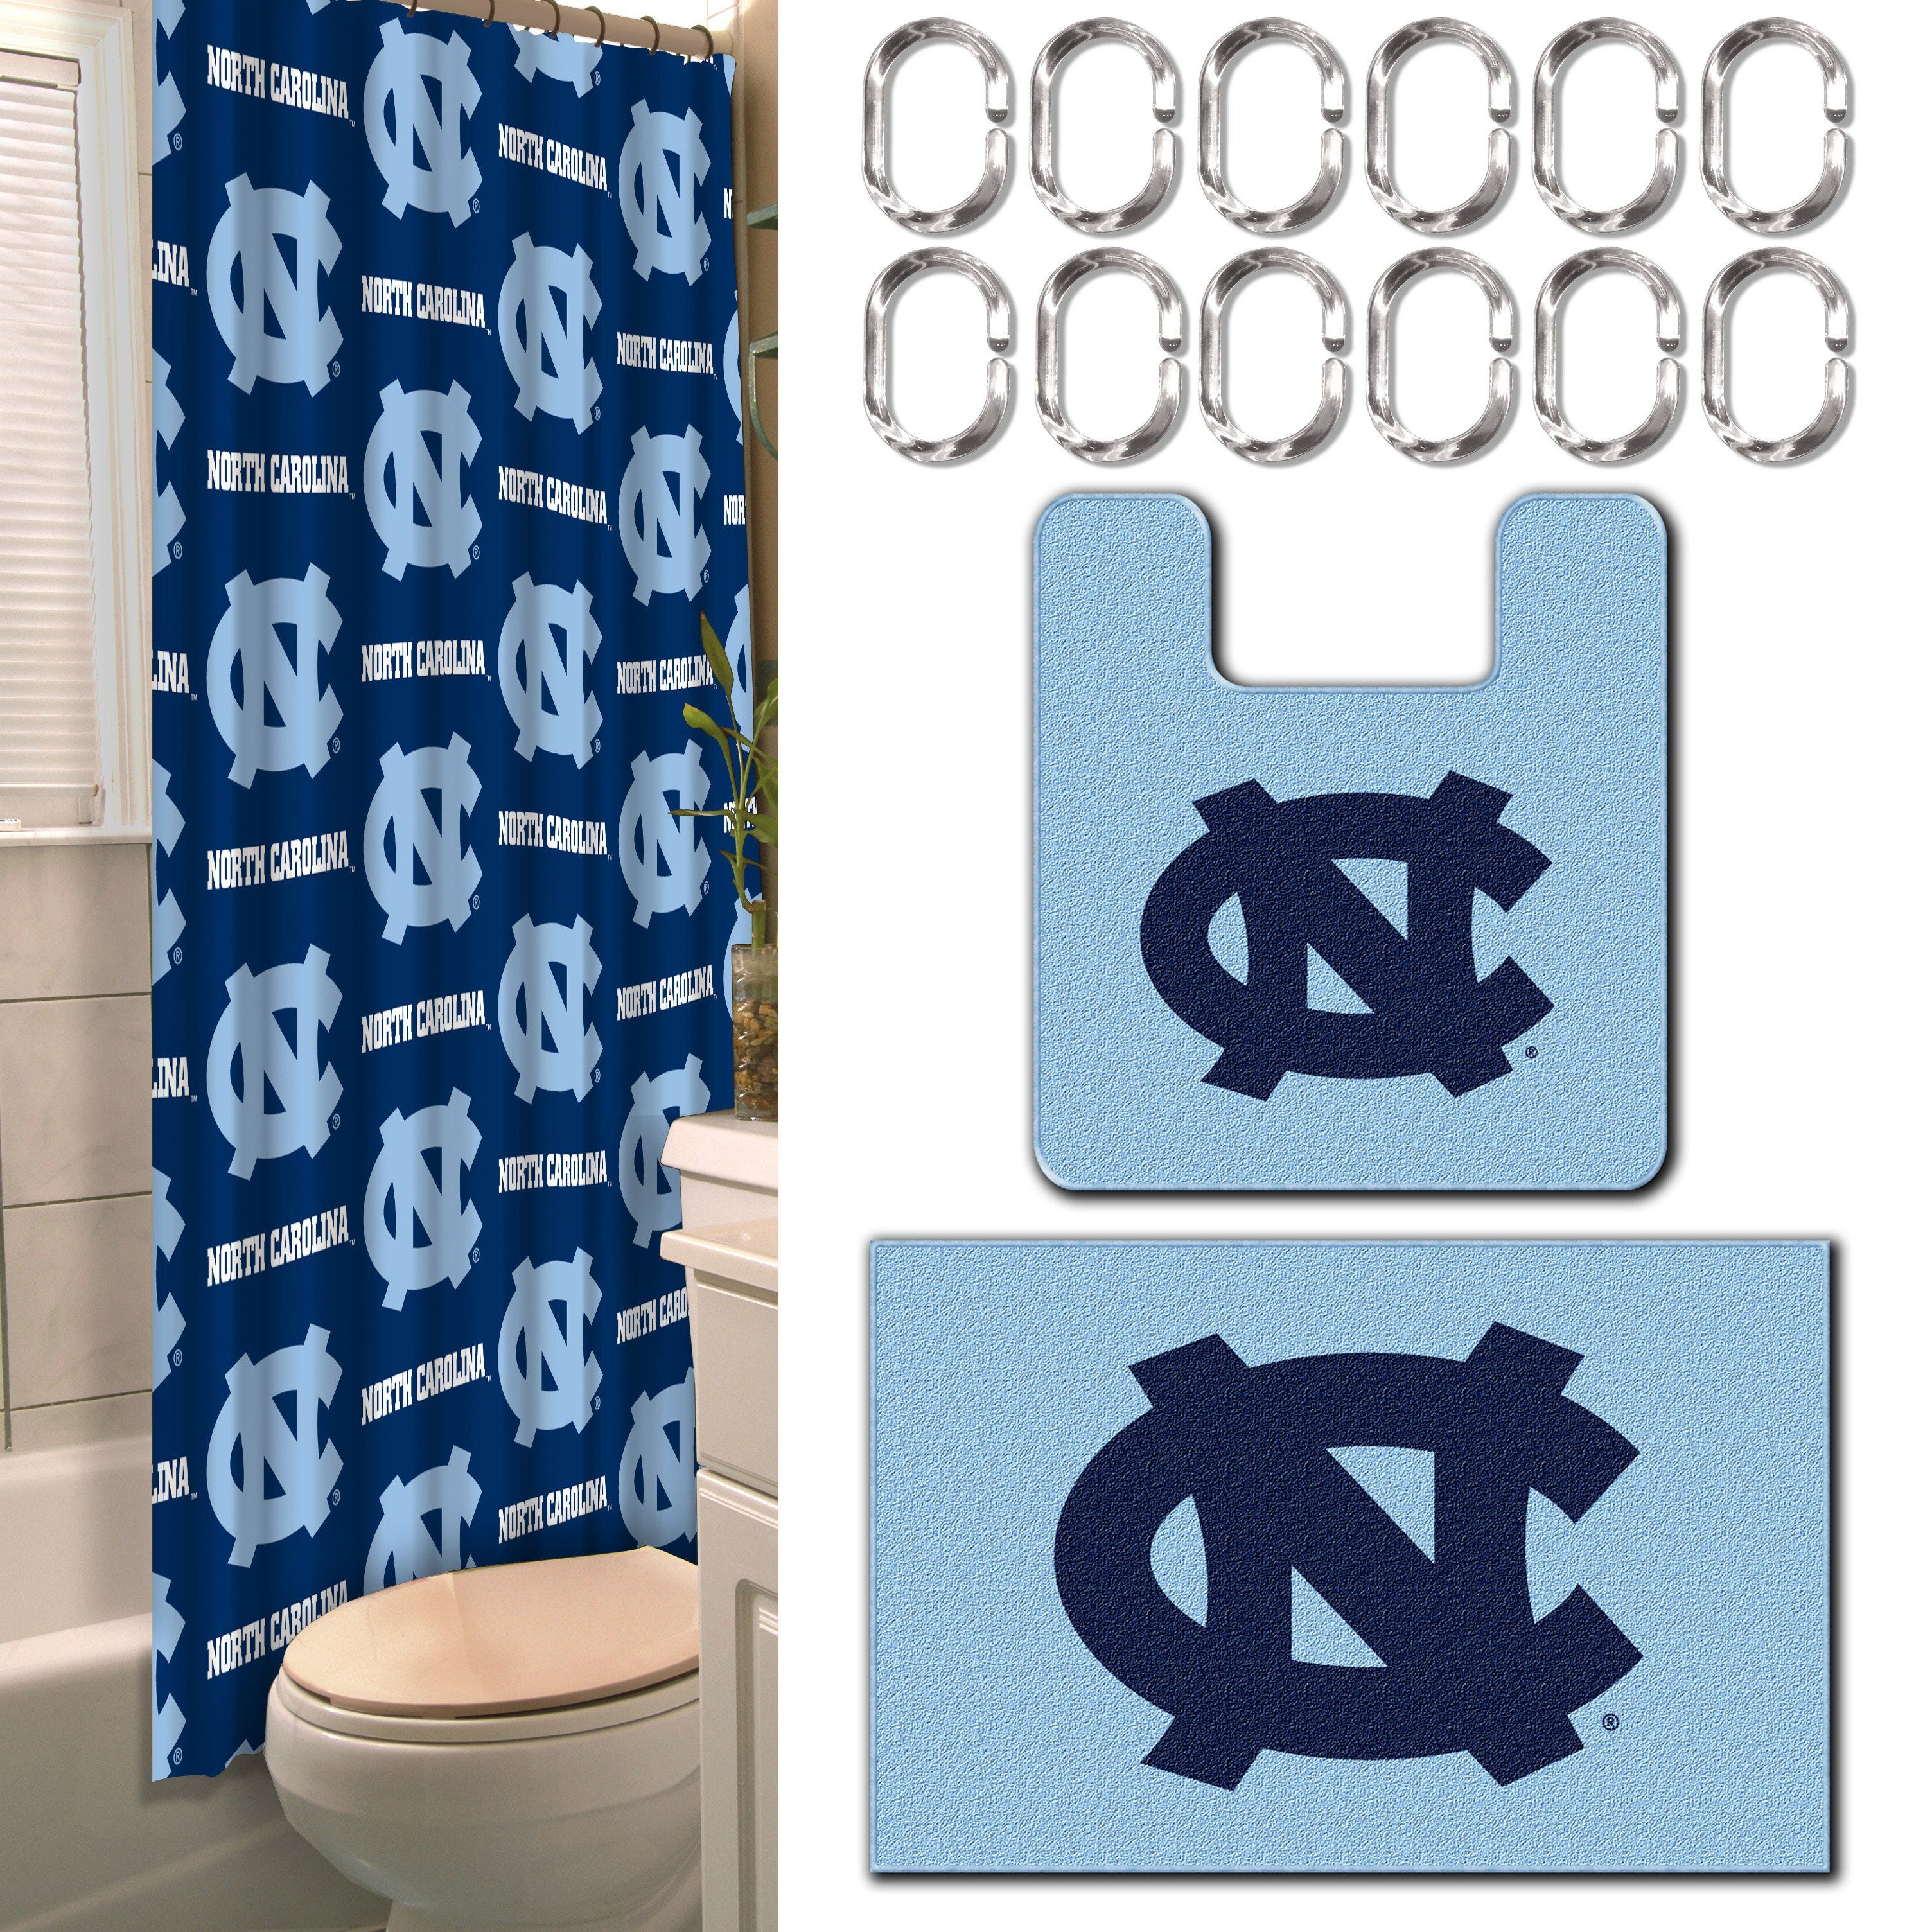 UNC Collegiate 15 Piece Bath Set 12 2 Shower Curtain Rings 1 72x 72 Mats